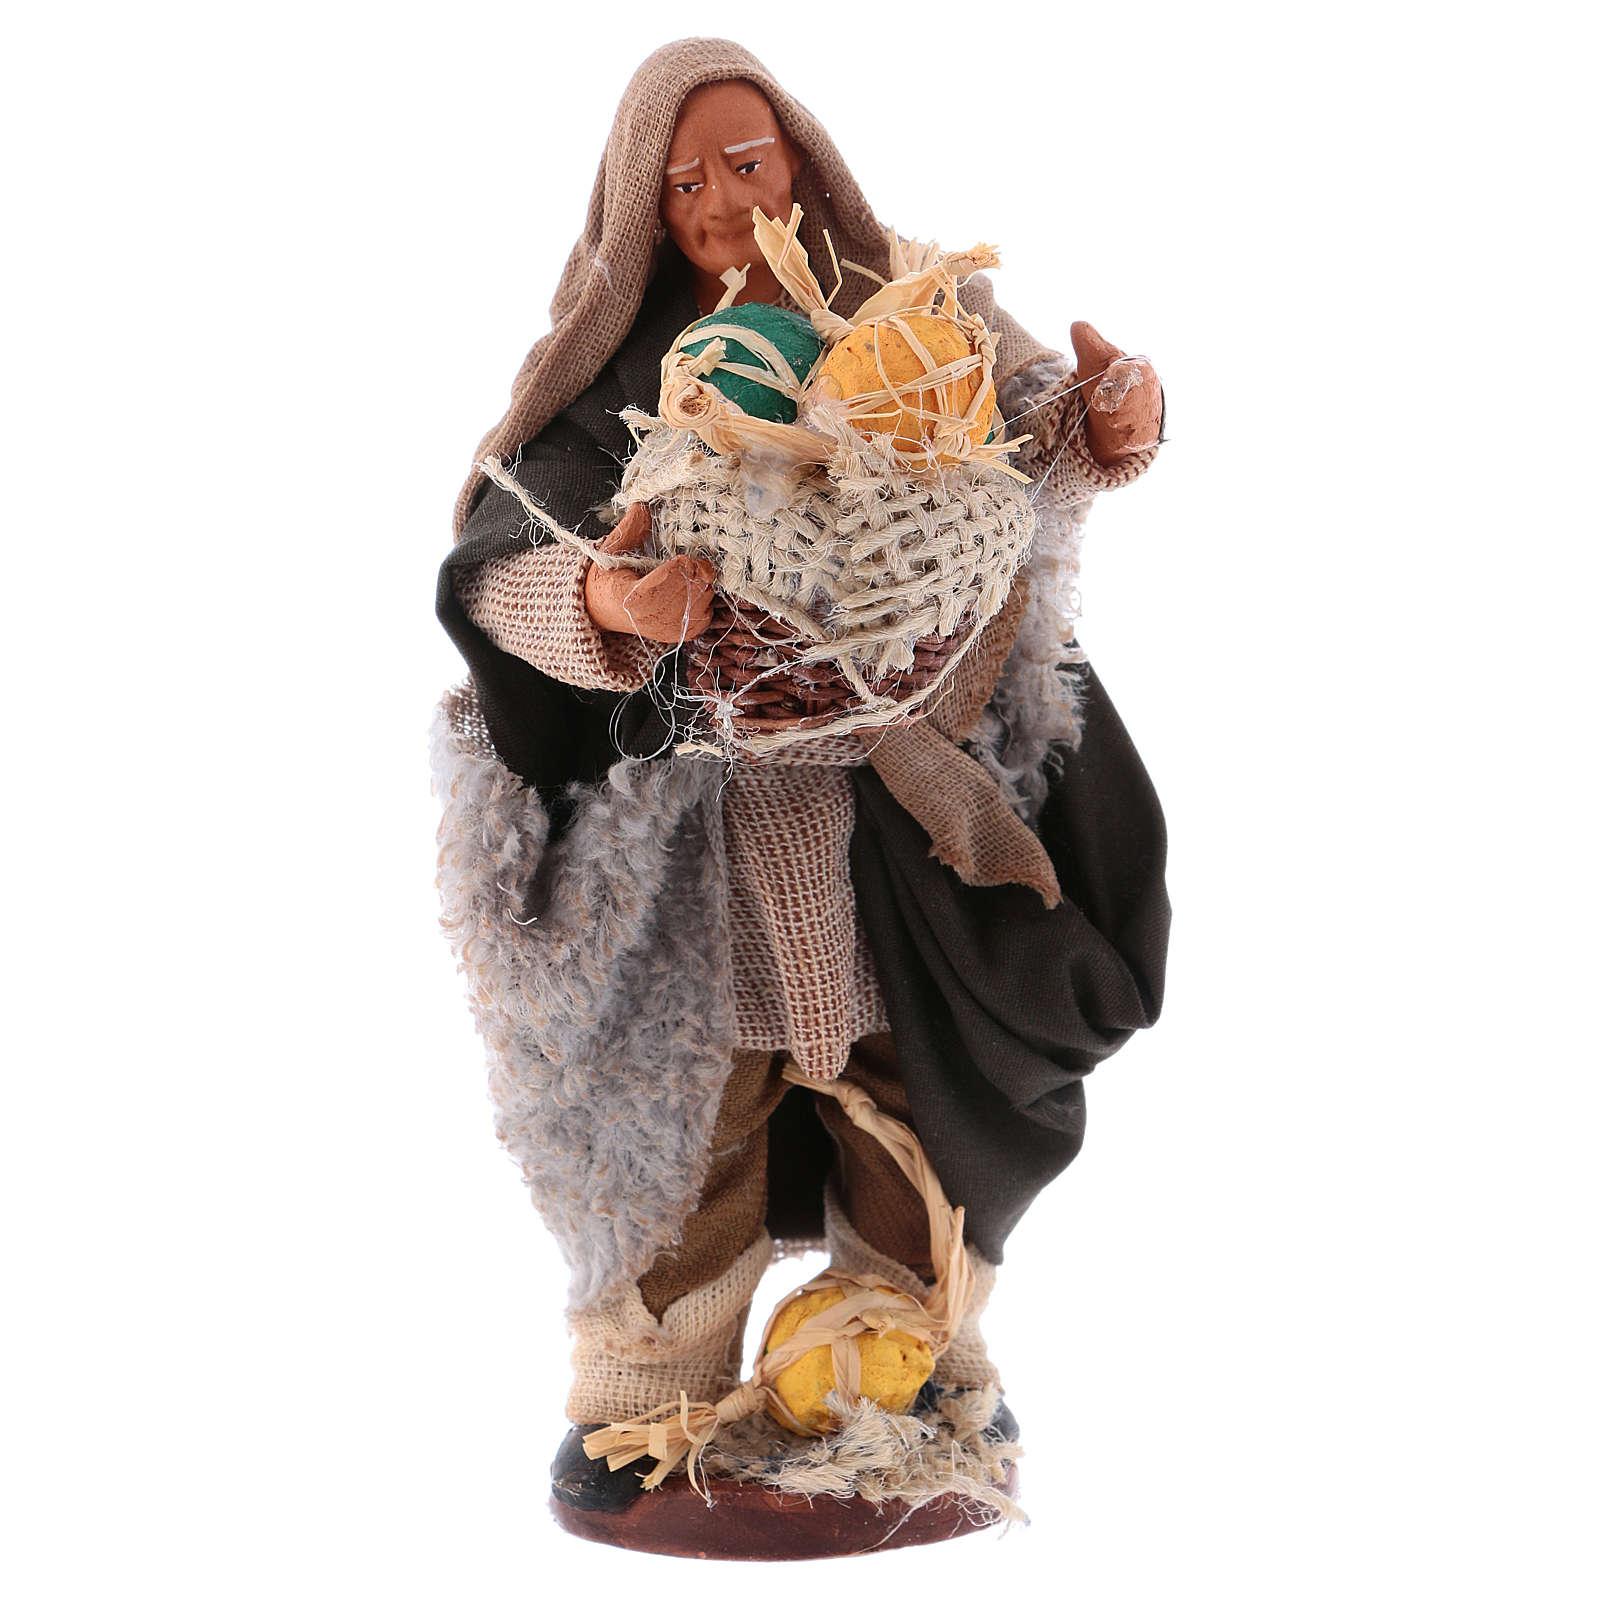 Man with melons basket 13cm Neapolitan Nativity figurine 4